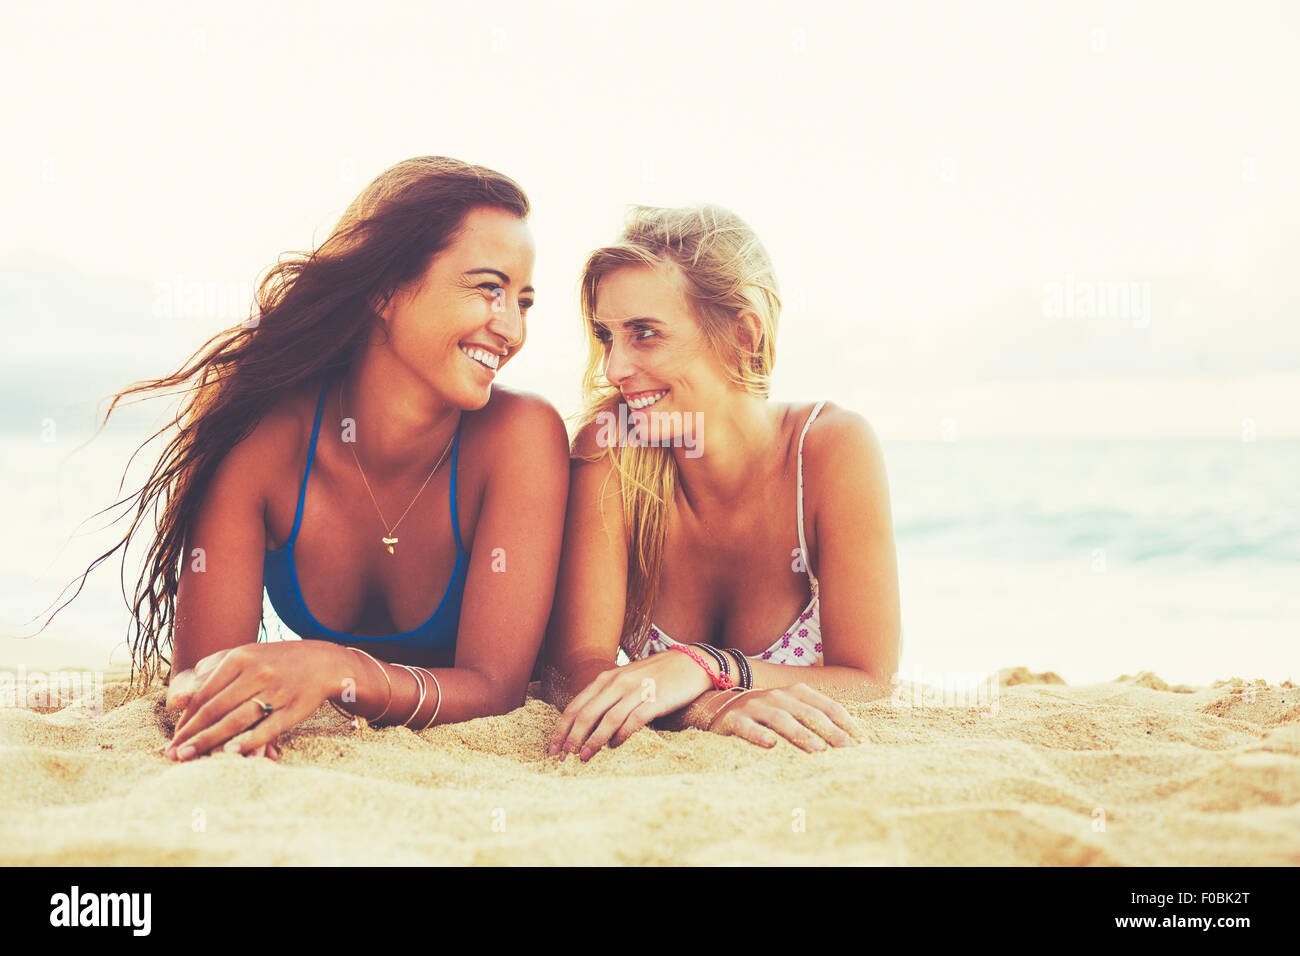 Sommer Lifestyle, Mädchen-Tag am Strand. Freunden abhängen am Strand bei Sonnenuntergang Stockbild